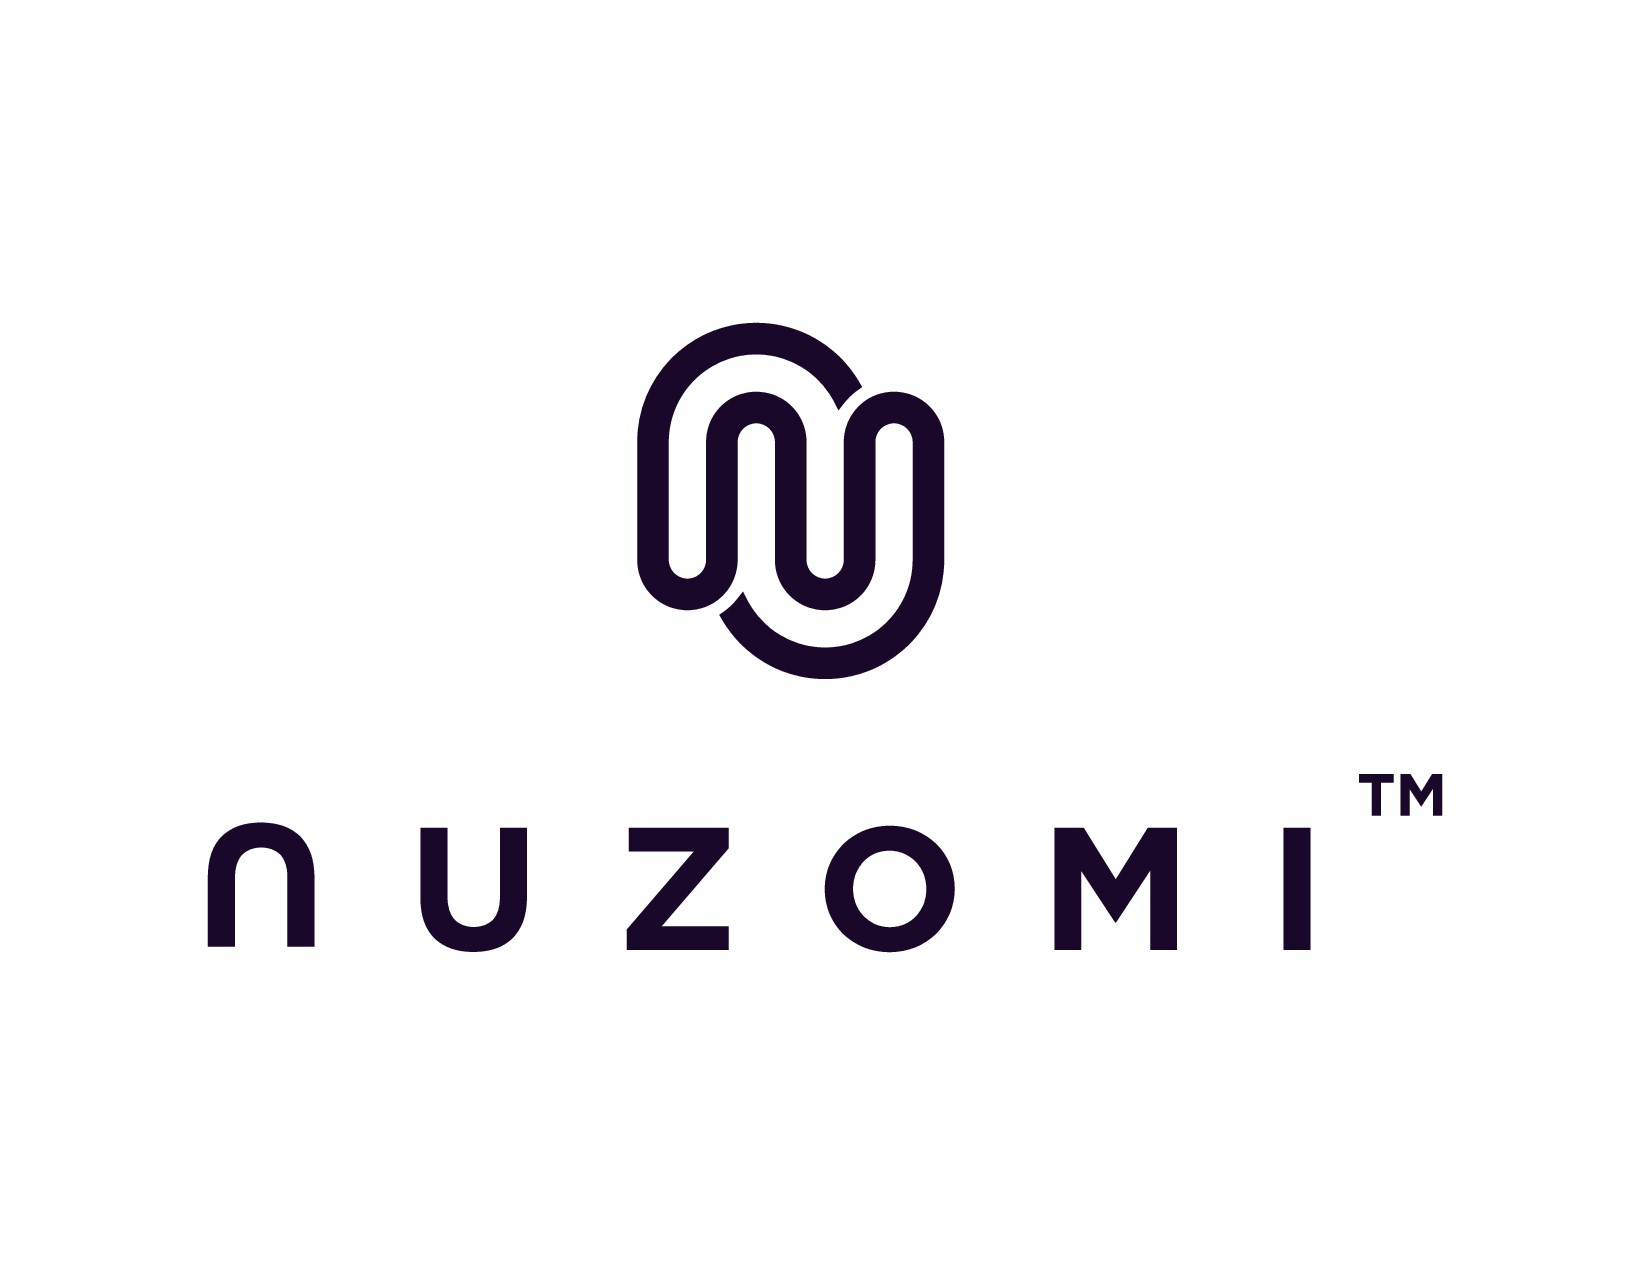 NUZOMI - Logo for a brand of sleek modern executive toys